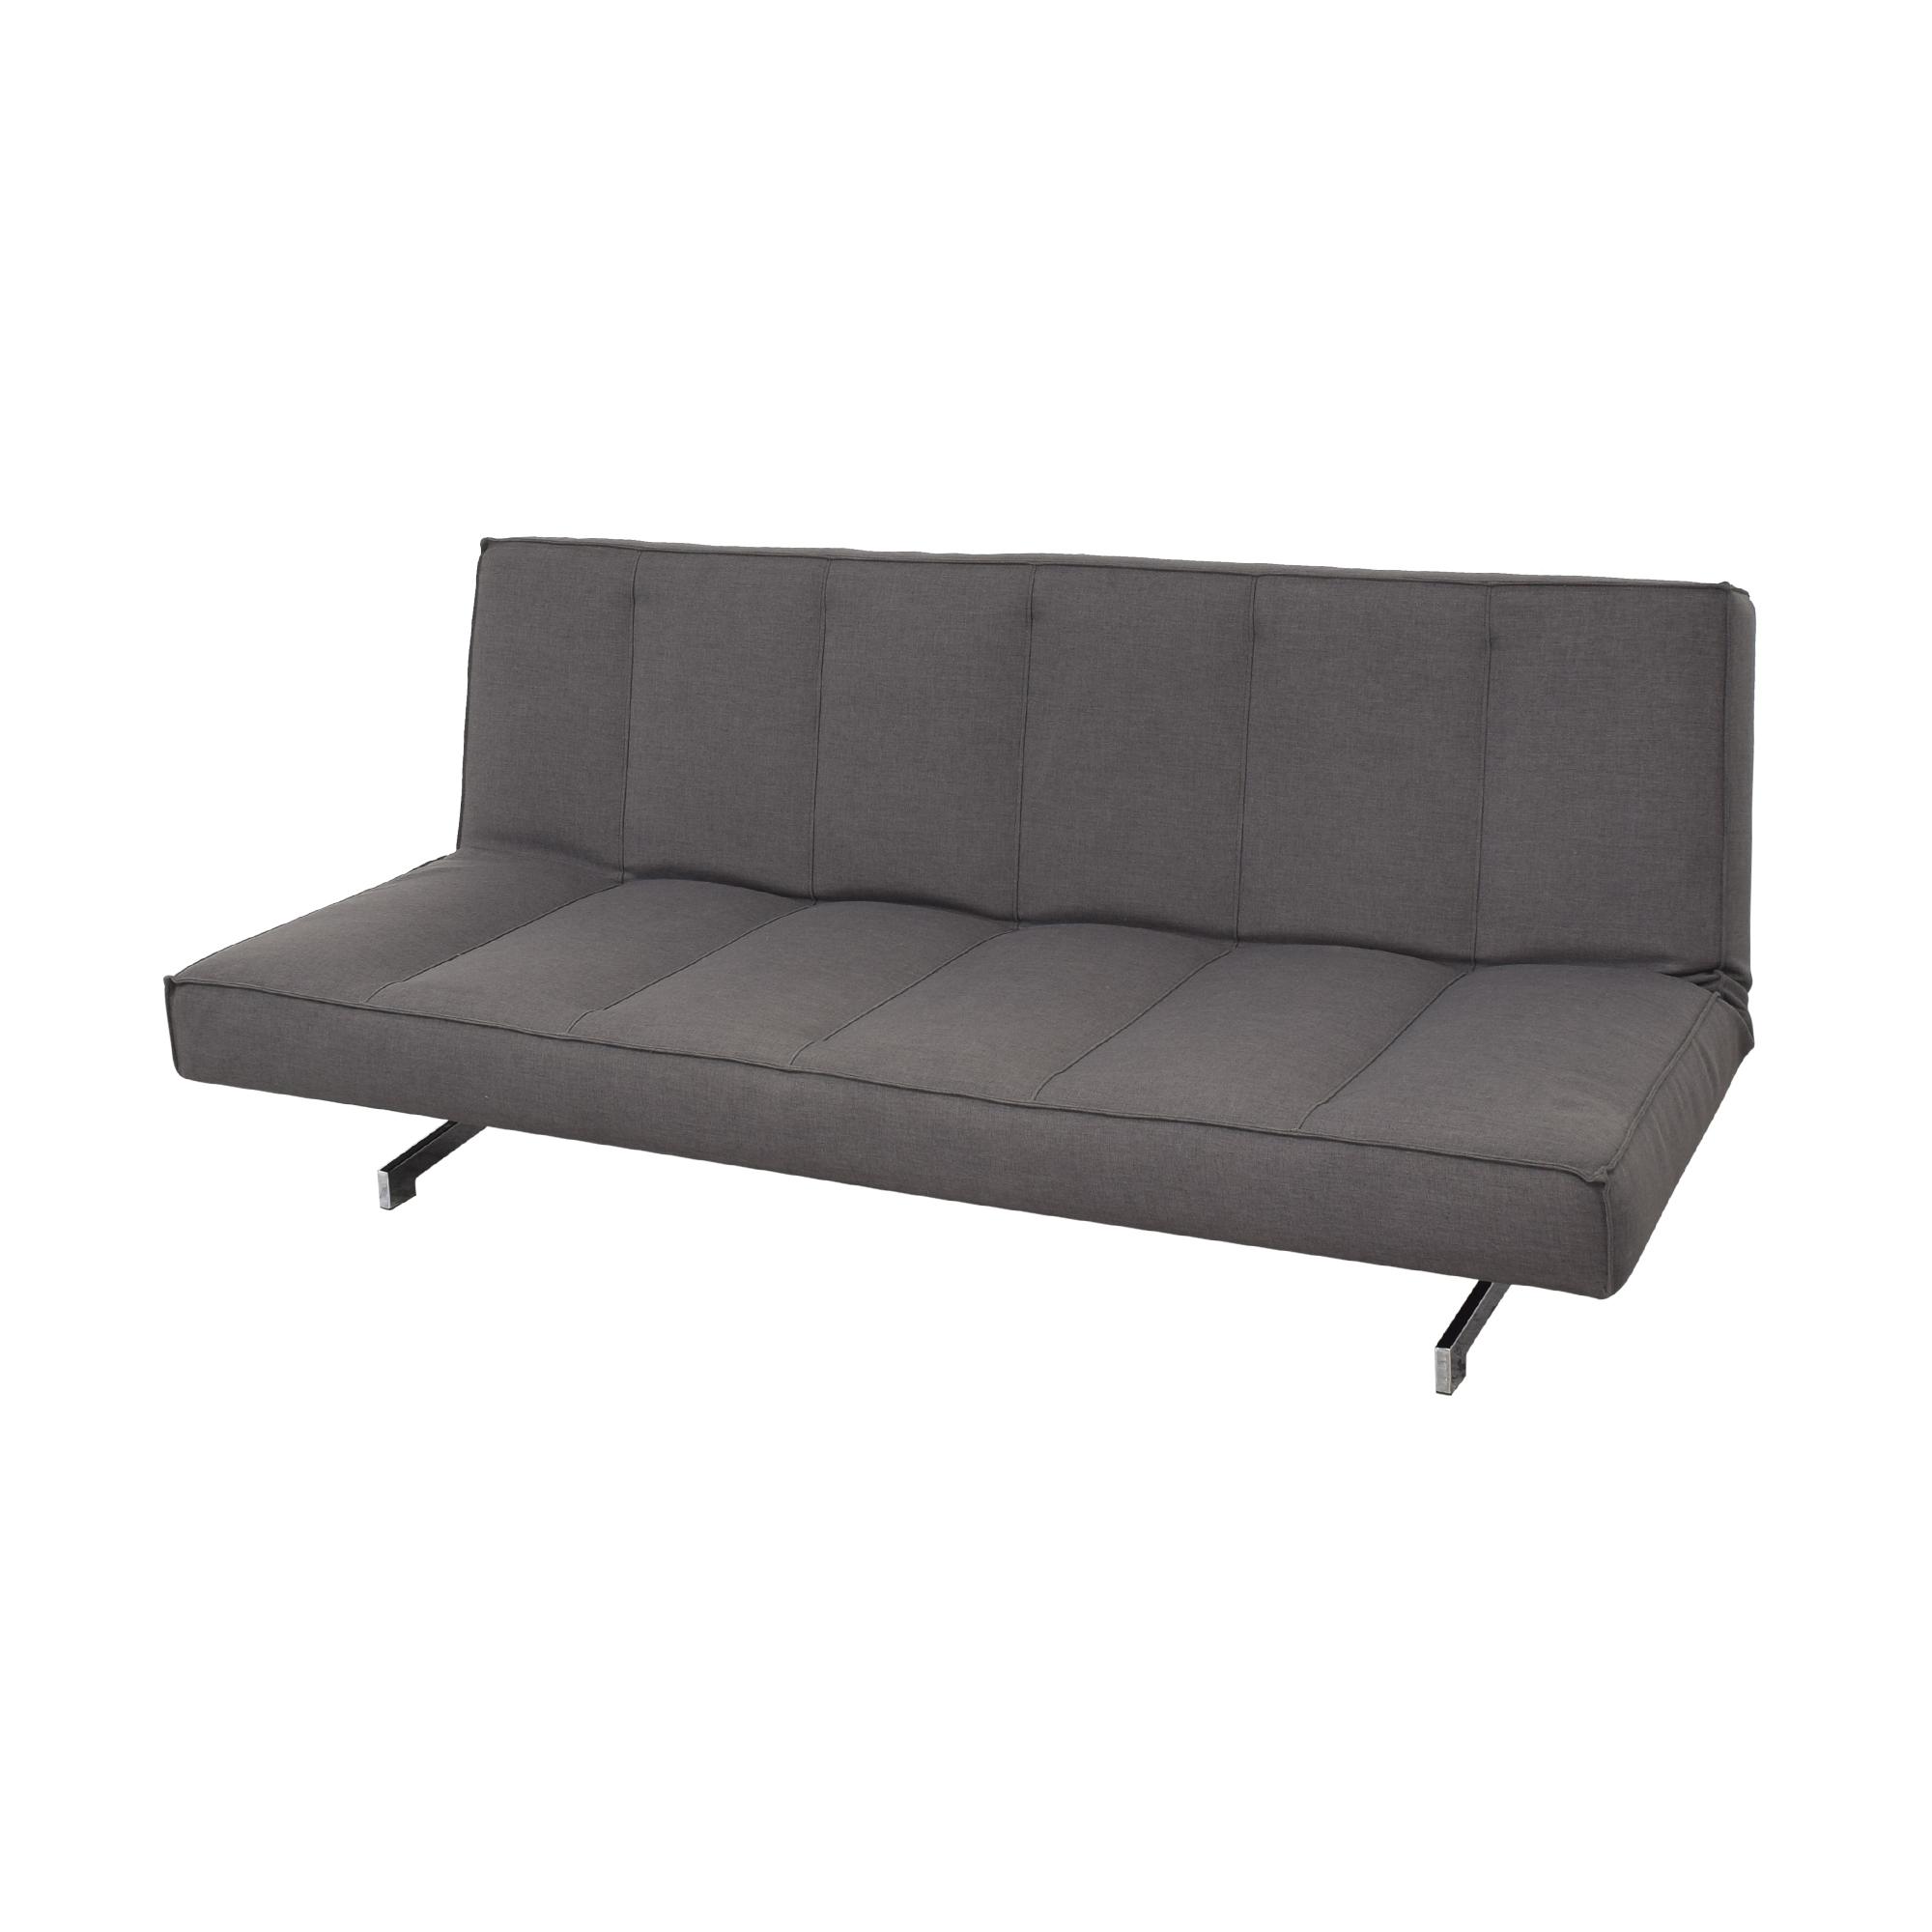 CB2 CB2 Flex Sleeper Sofa pa